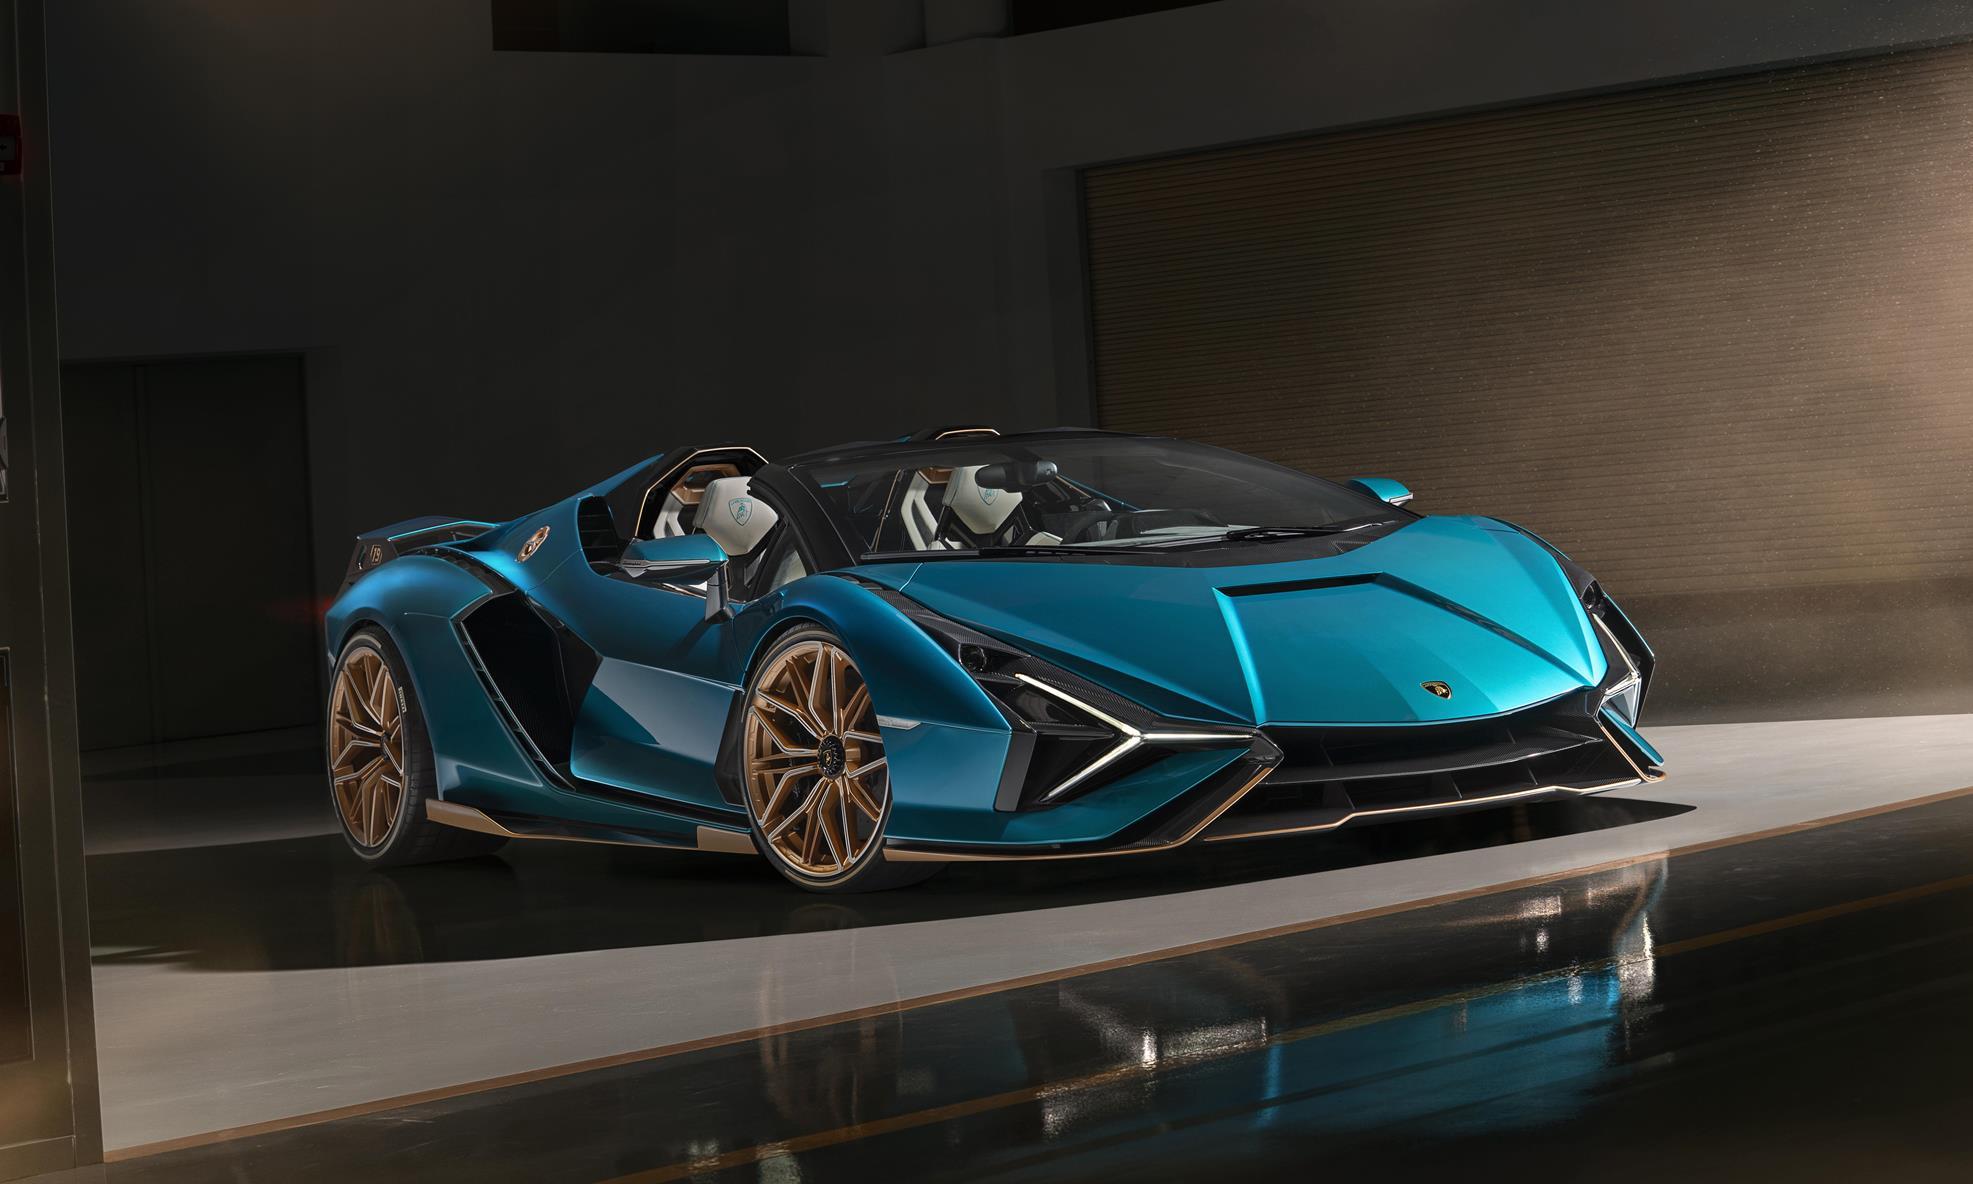 Lamborghini Sian Roadster front